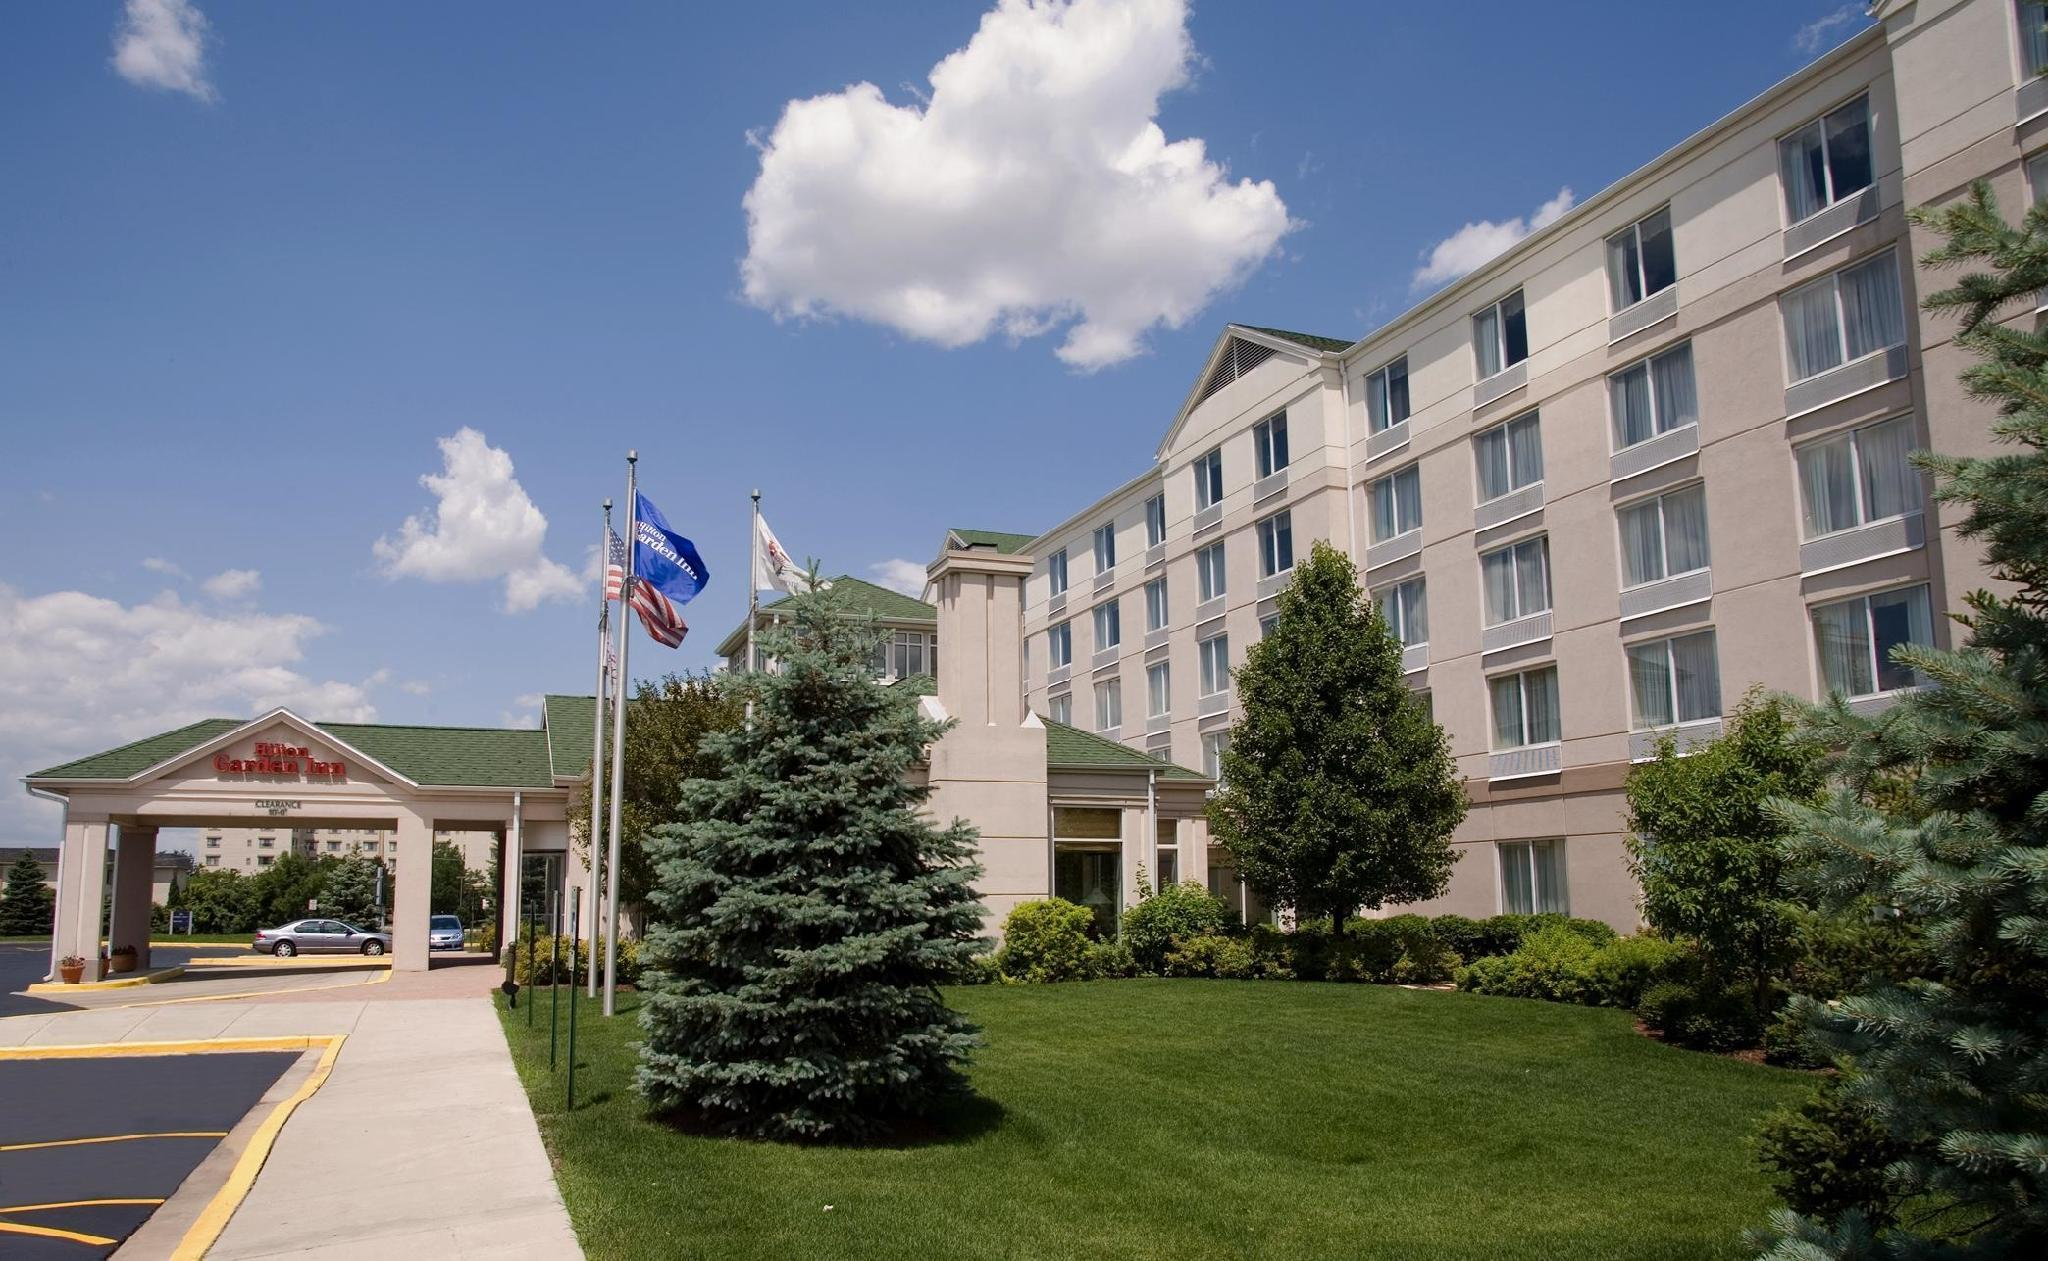 Hilton Garden Inn Chicago/Oakbrook Terrace image